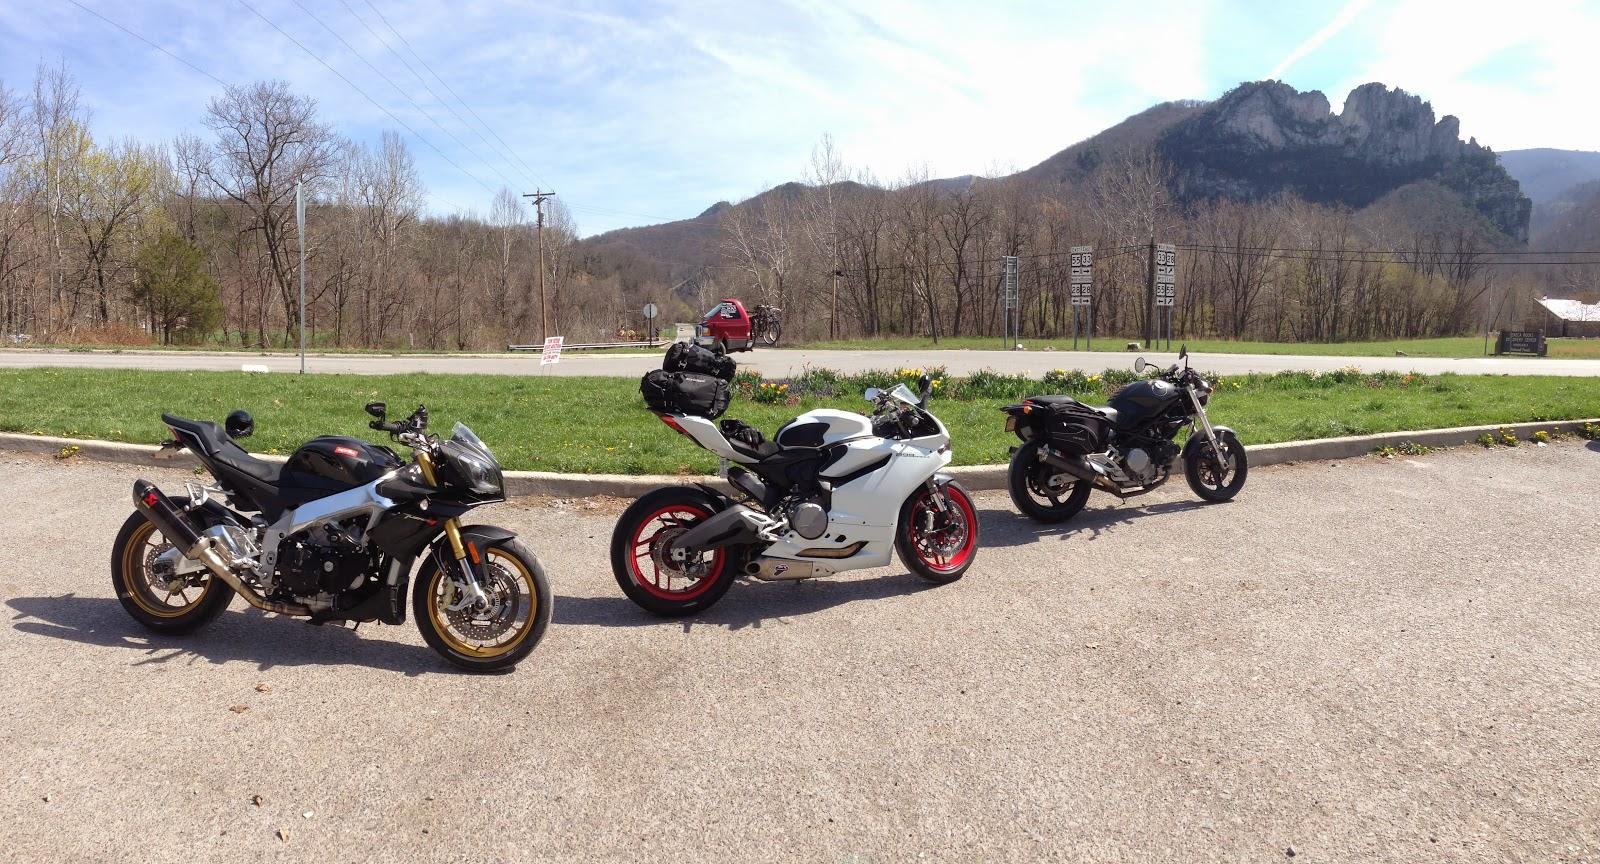 Tigho NYDucati: Cross Country USA on Italian Superbikes